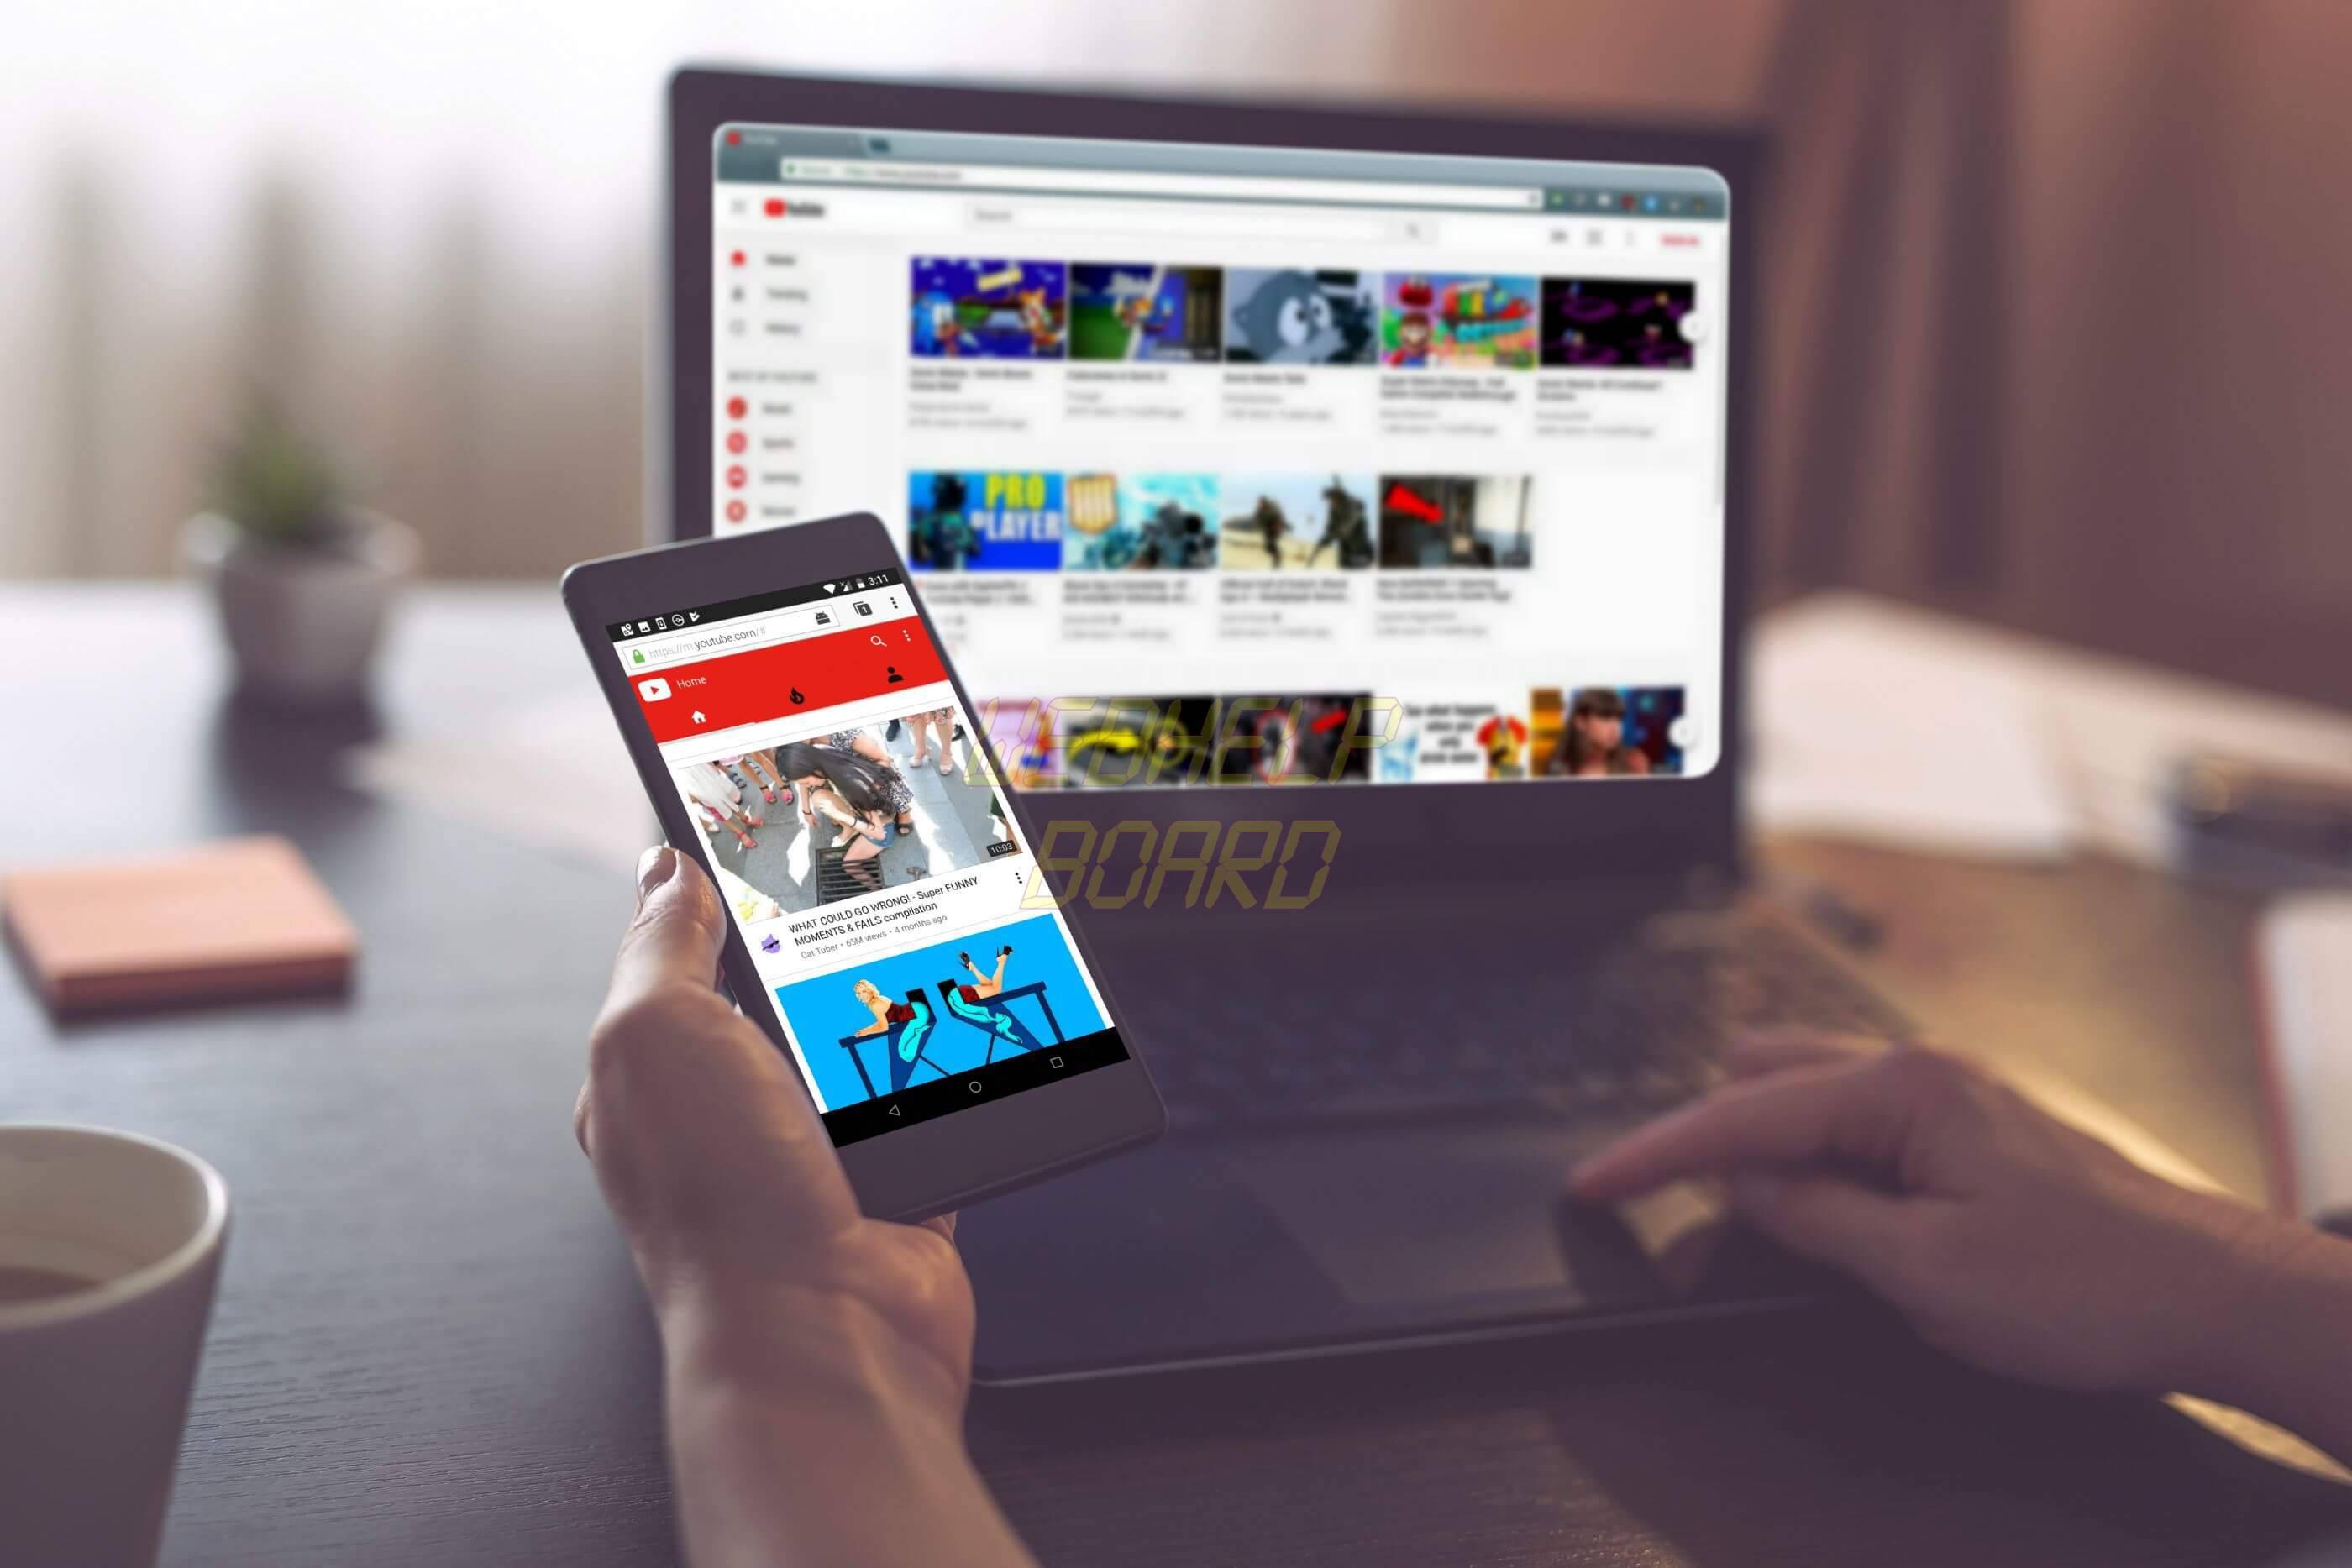 youtube ad - Como parar de ver uma propaganda específica no YouTube